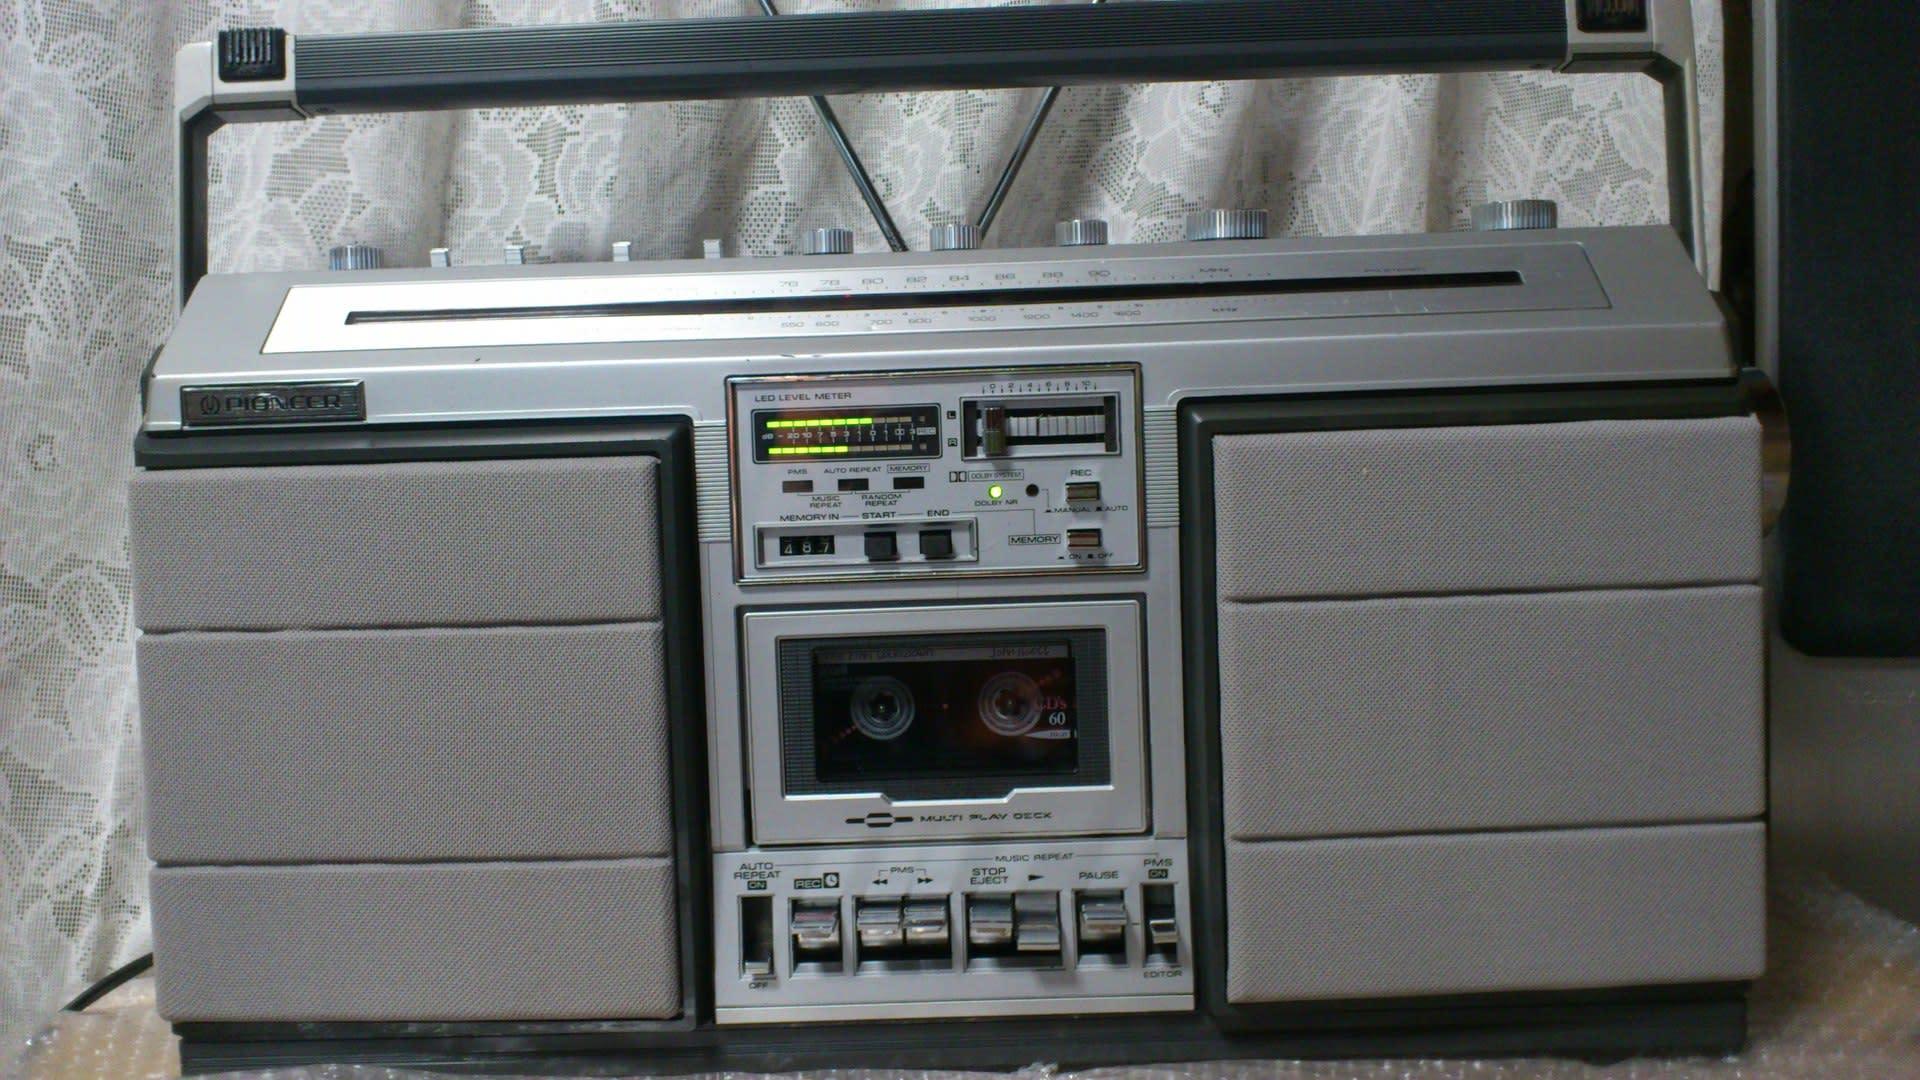 Pioneer vsx 1021 k manual ebook photos of onkyo stereo repair array uncategorized u2013 field ftp space rh lohang tk fandeluxe Choice Image